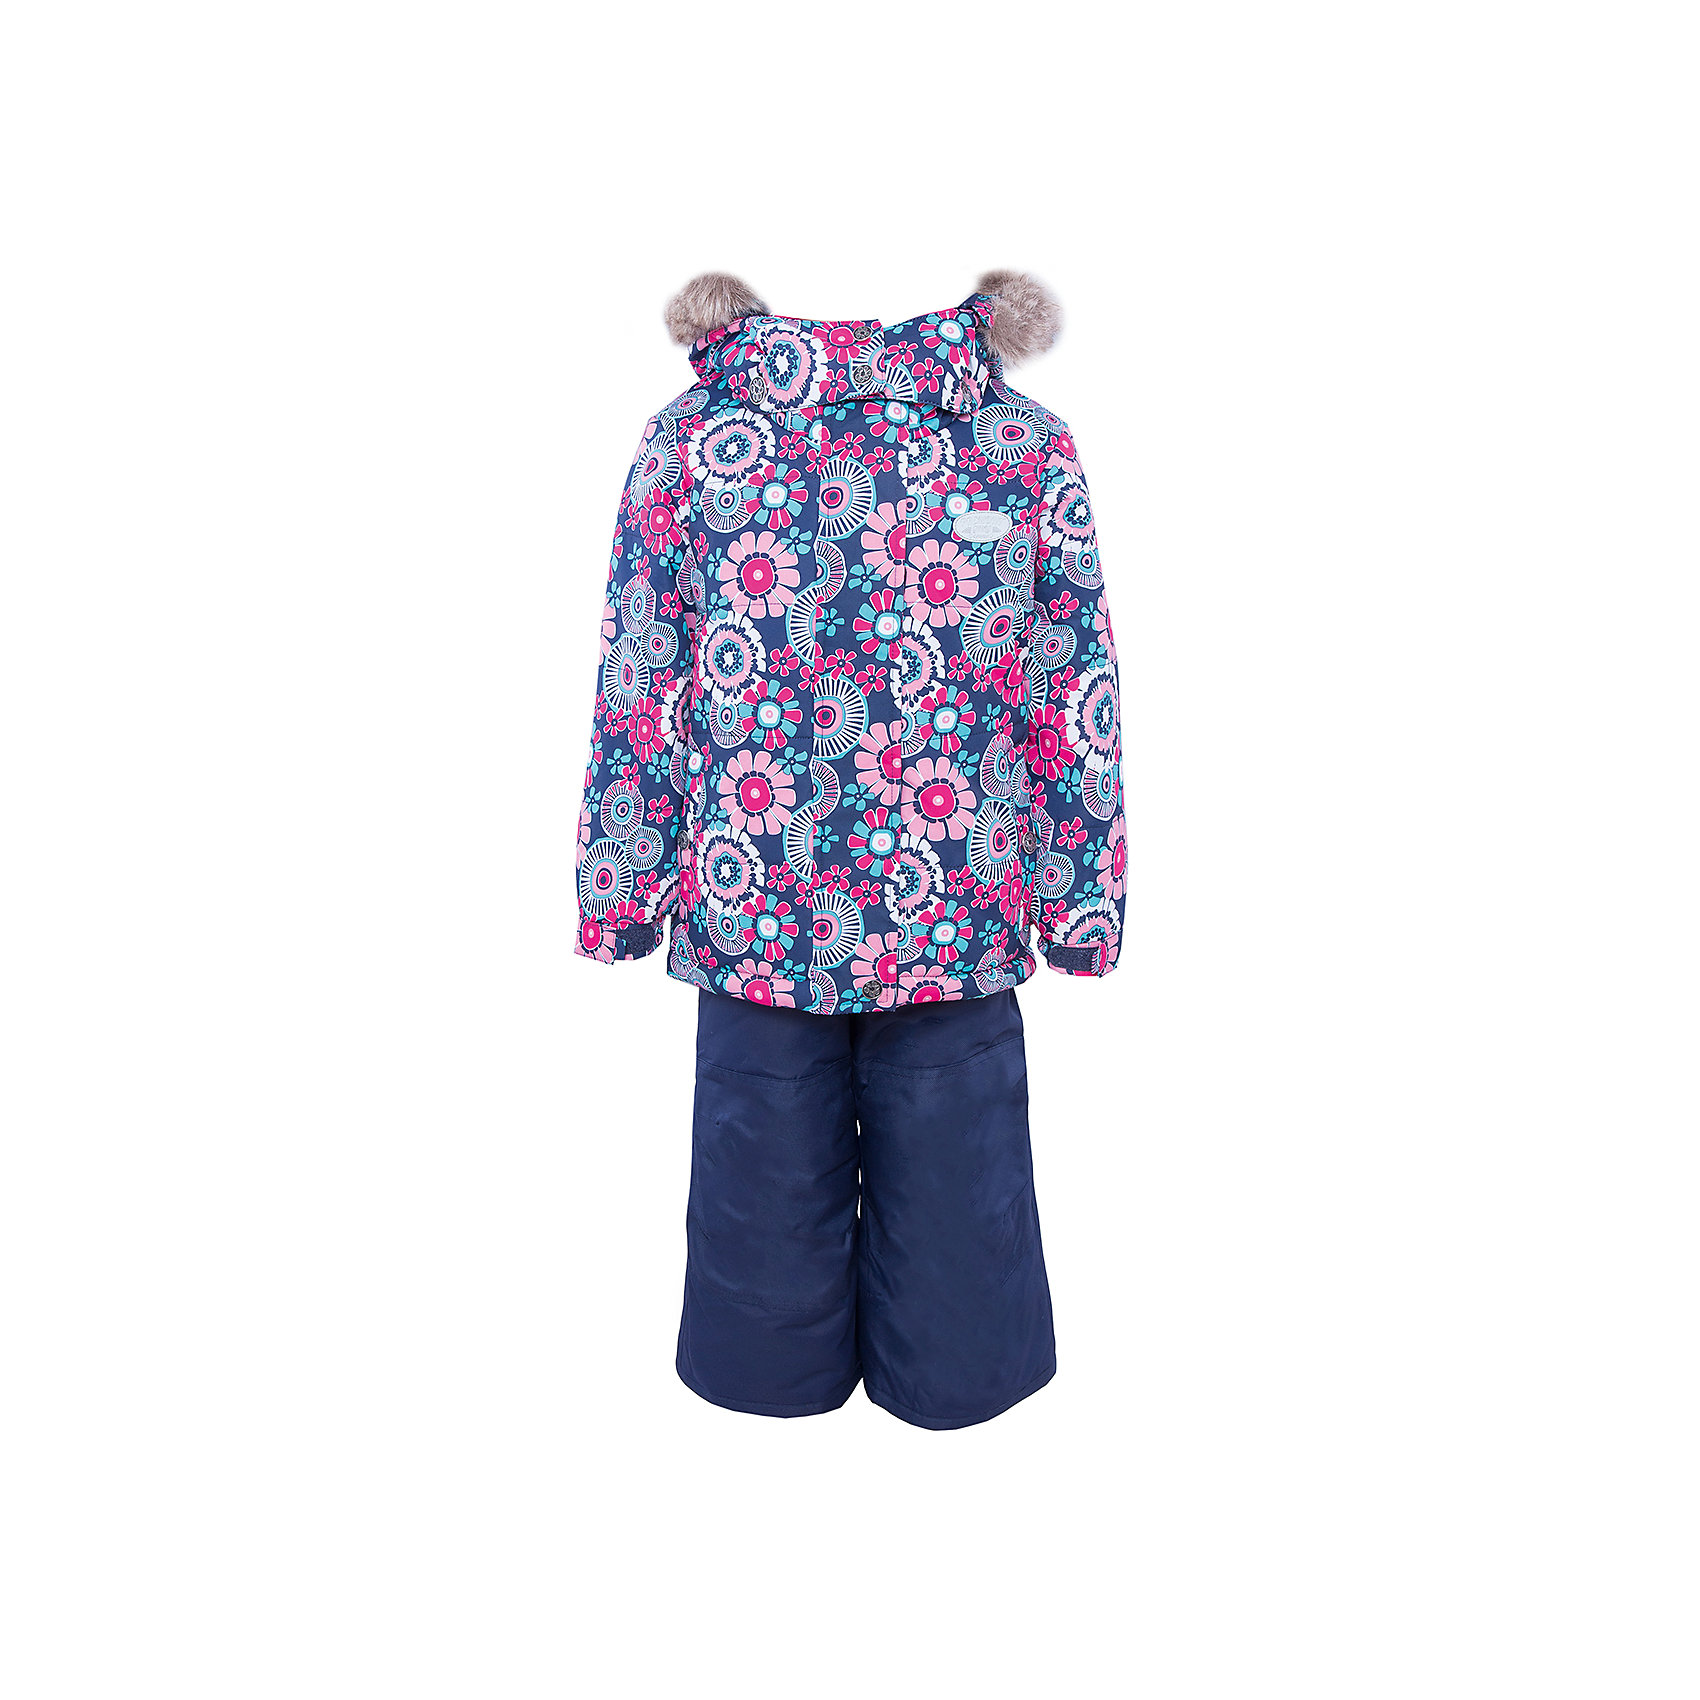 Premont Комплект: куртка и брюки для девочки Premont